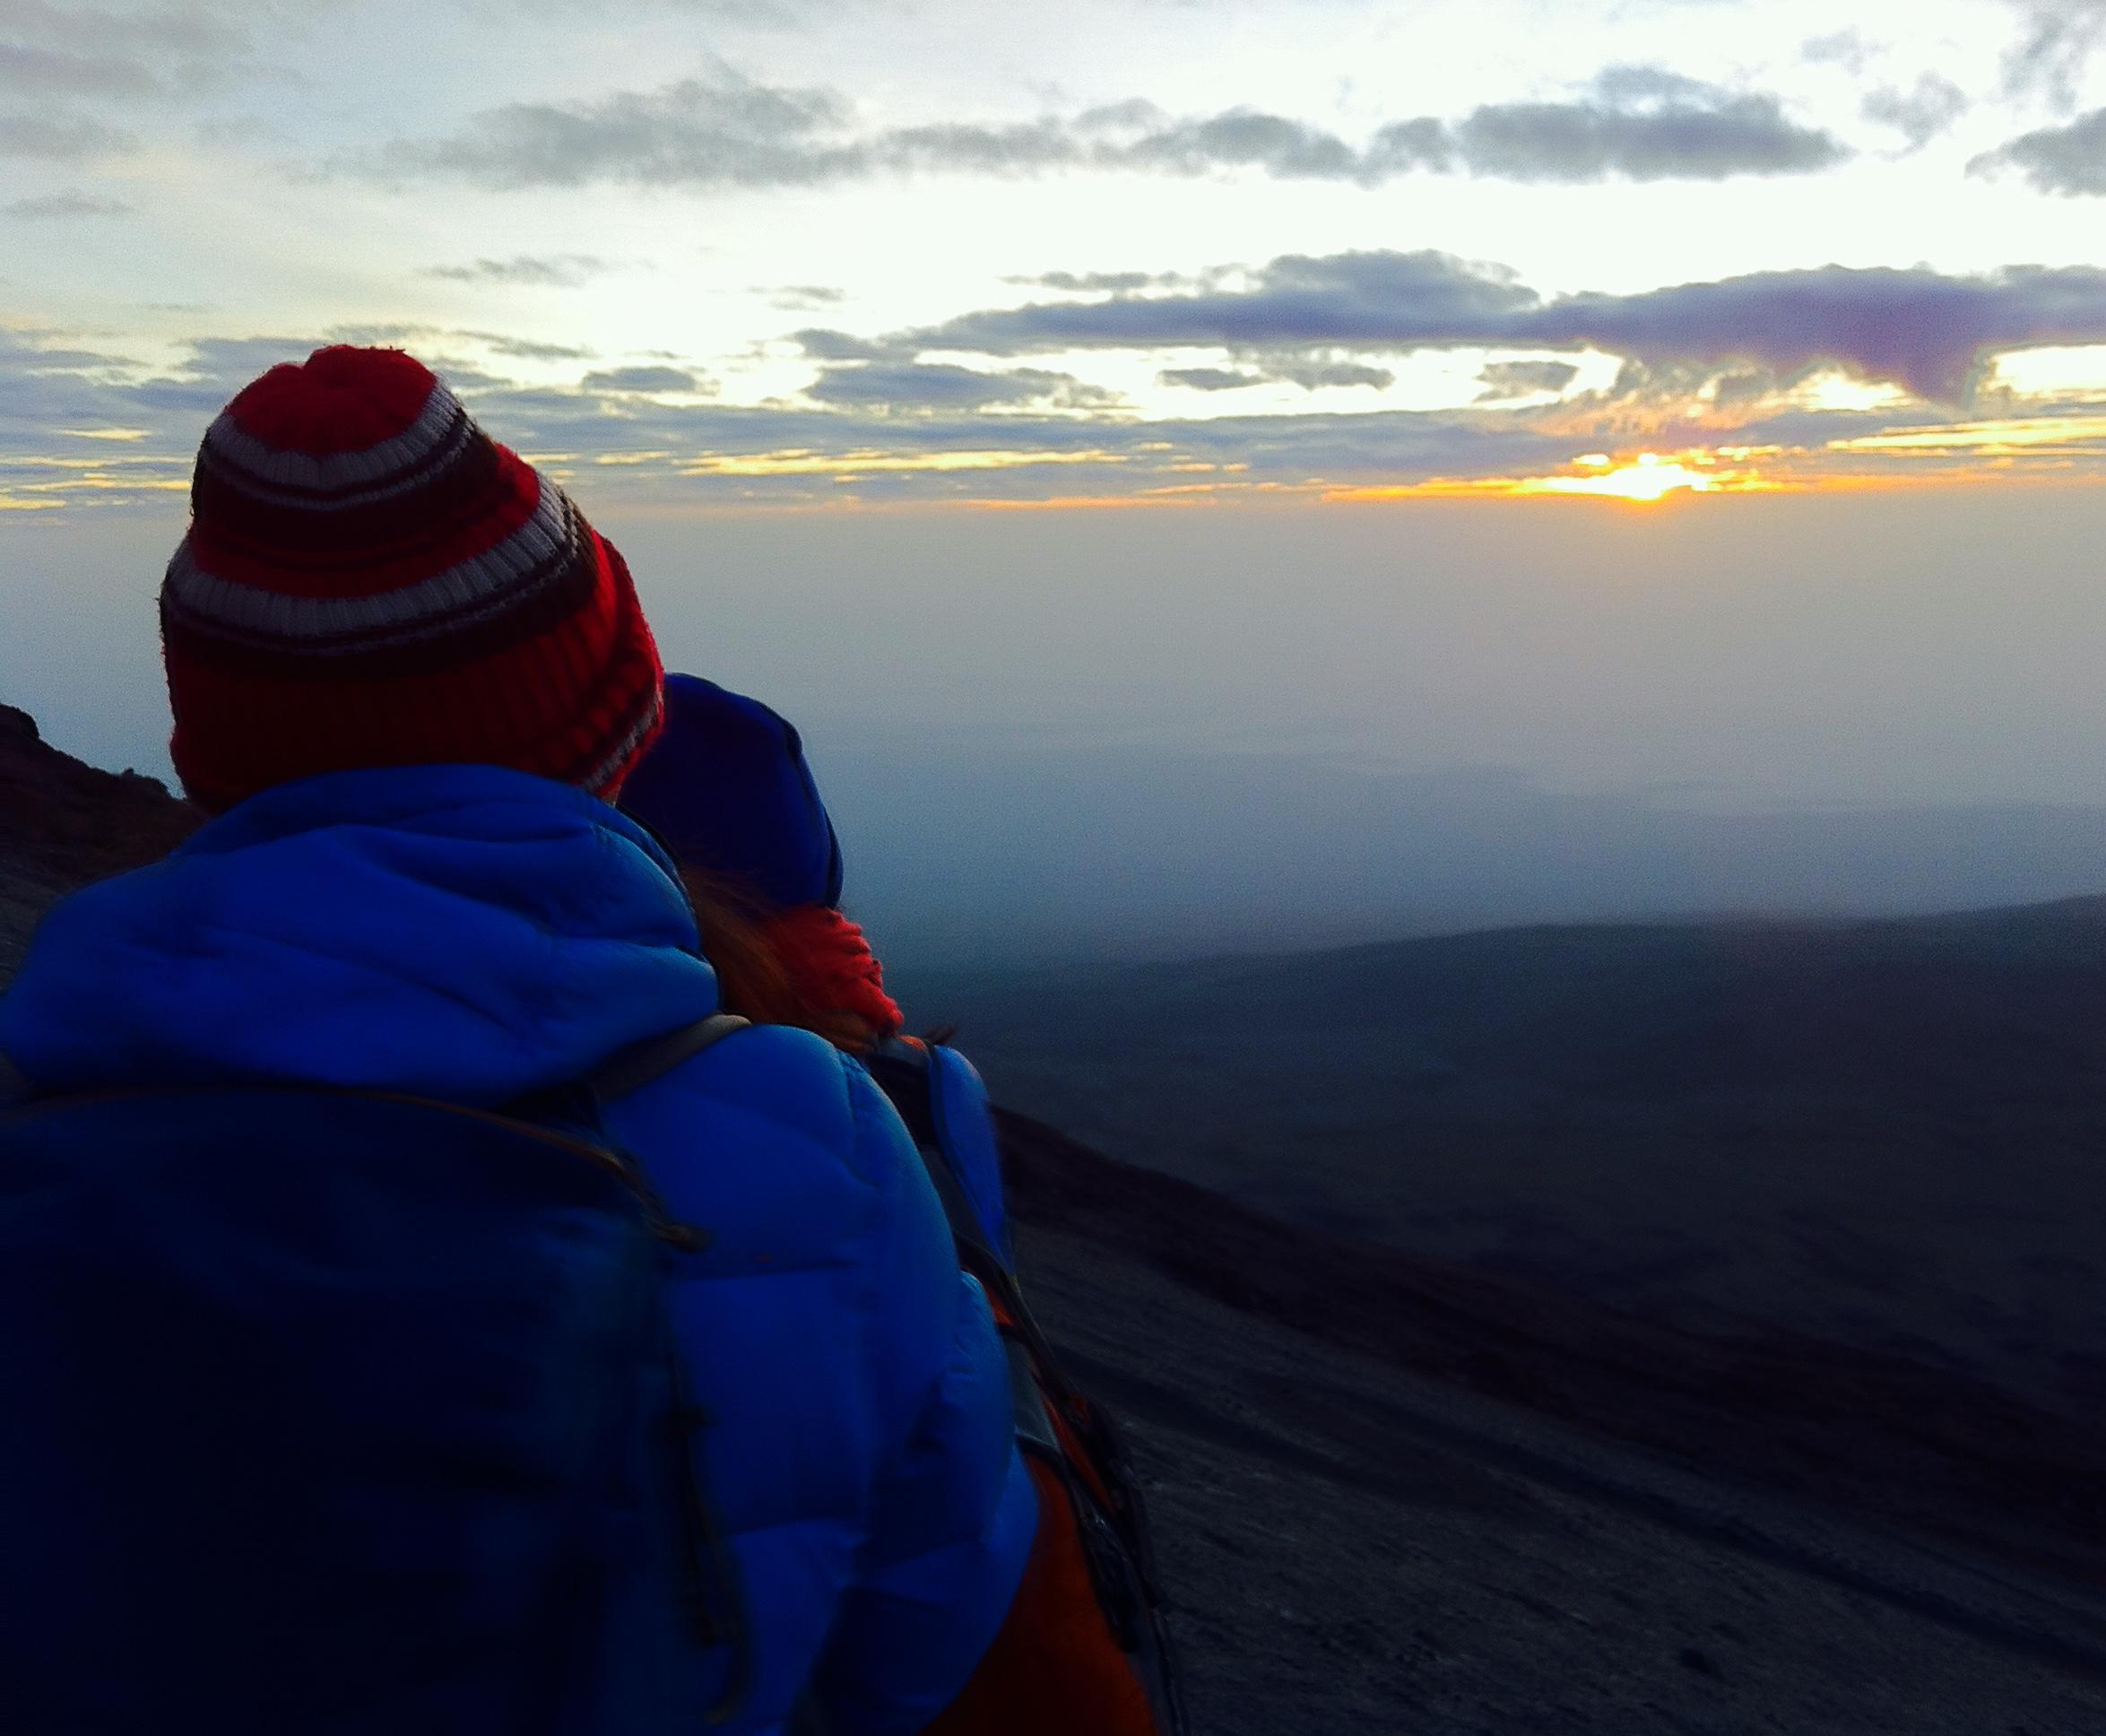 Sunrise on the final ascent of Kilimanjaro's Kibo peak